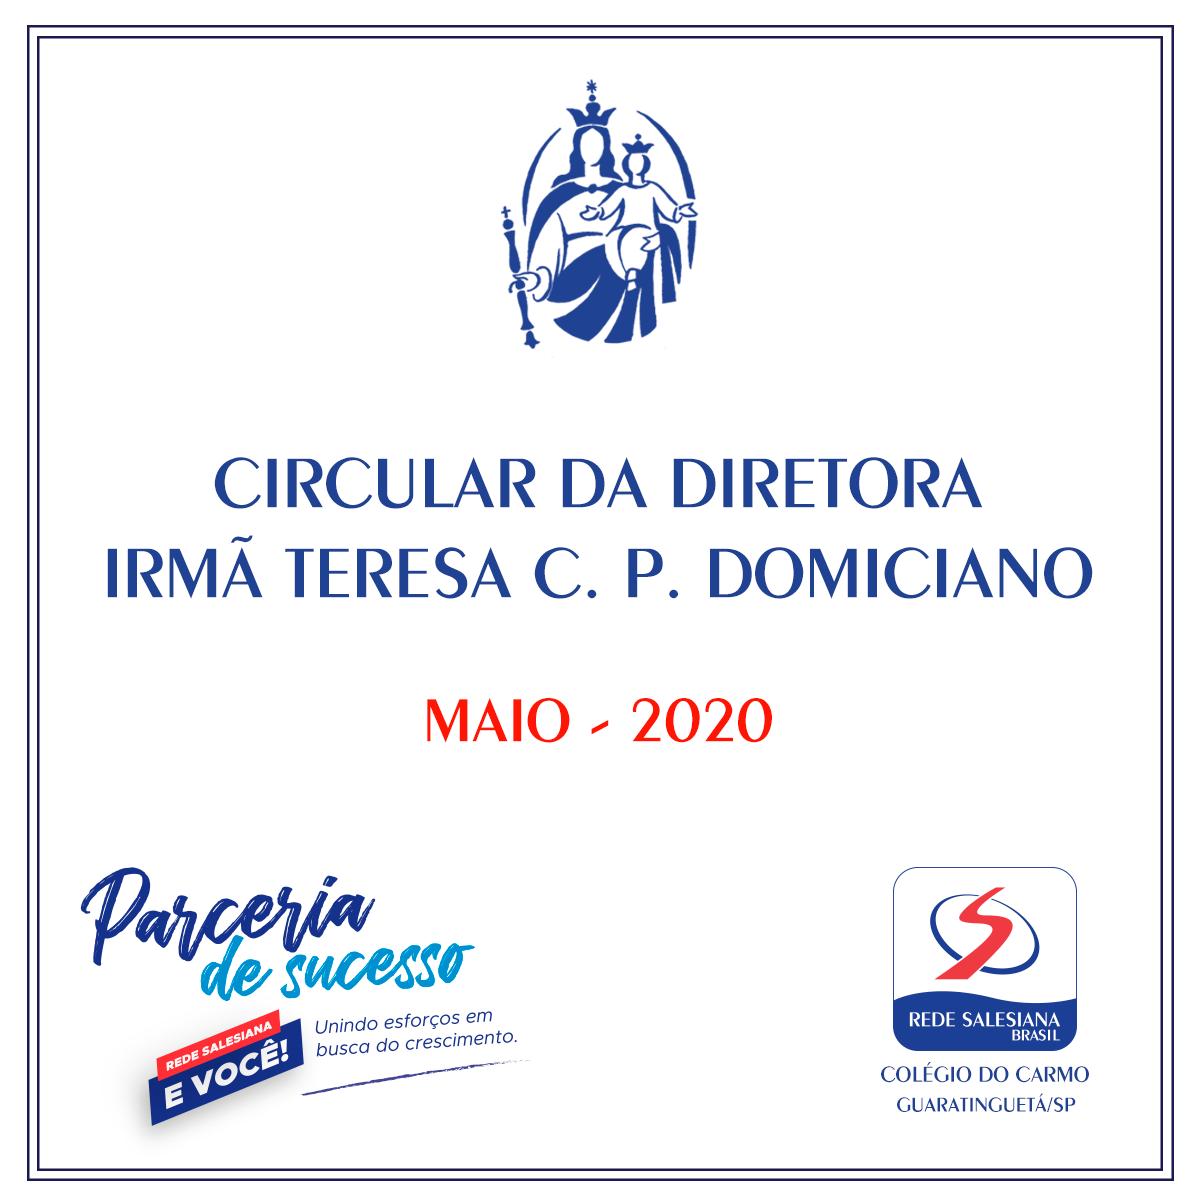 Circular da Diretora - Nº04/2020